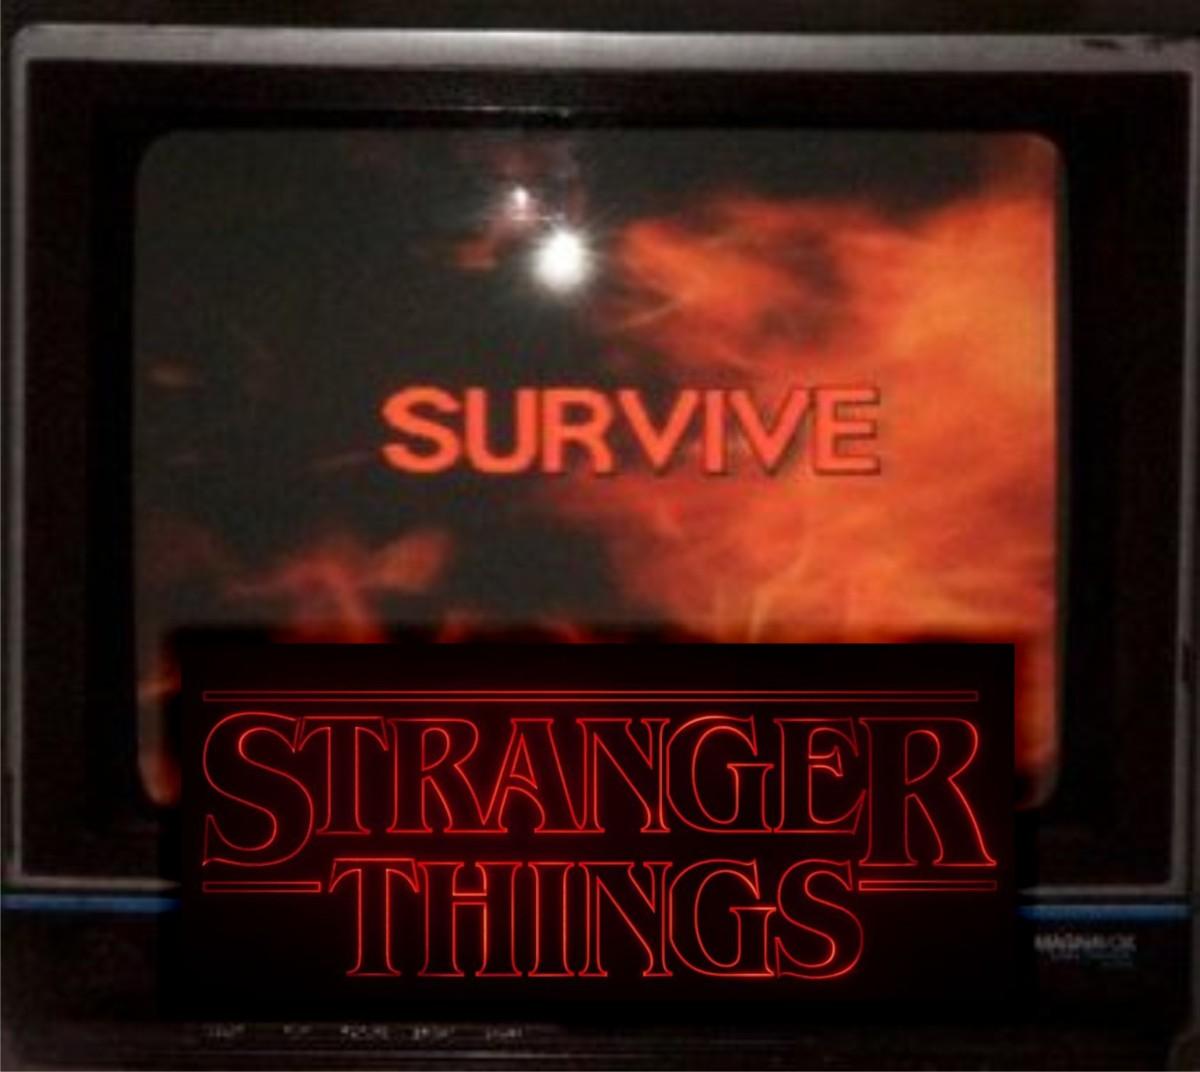 survive stranger things